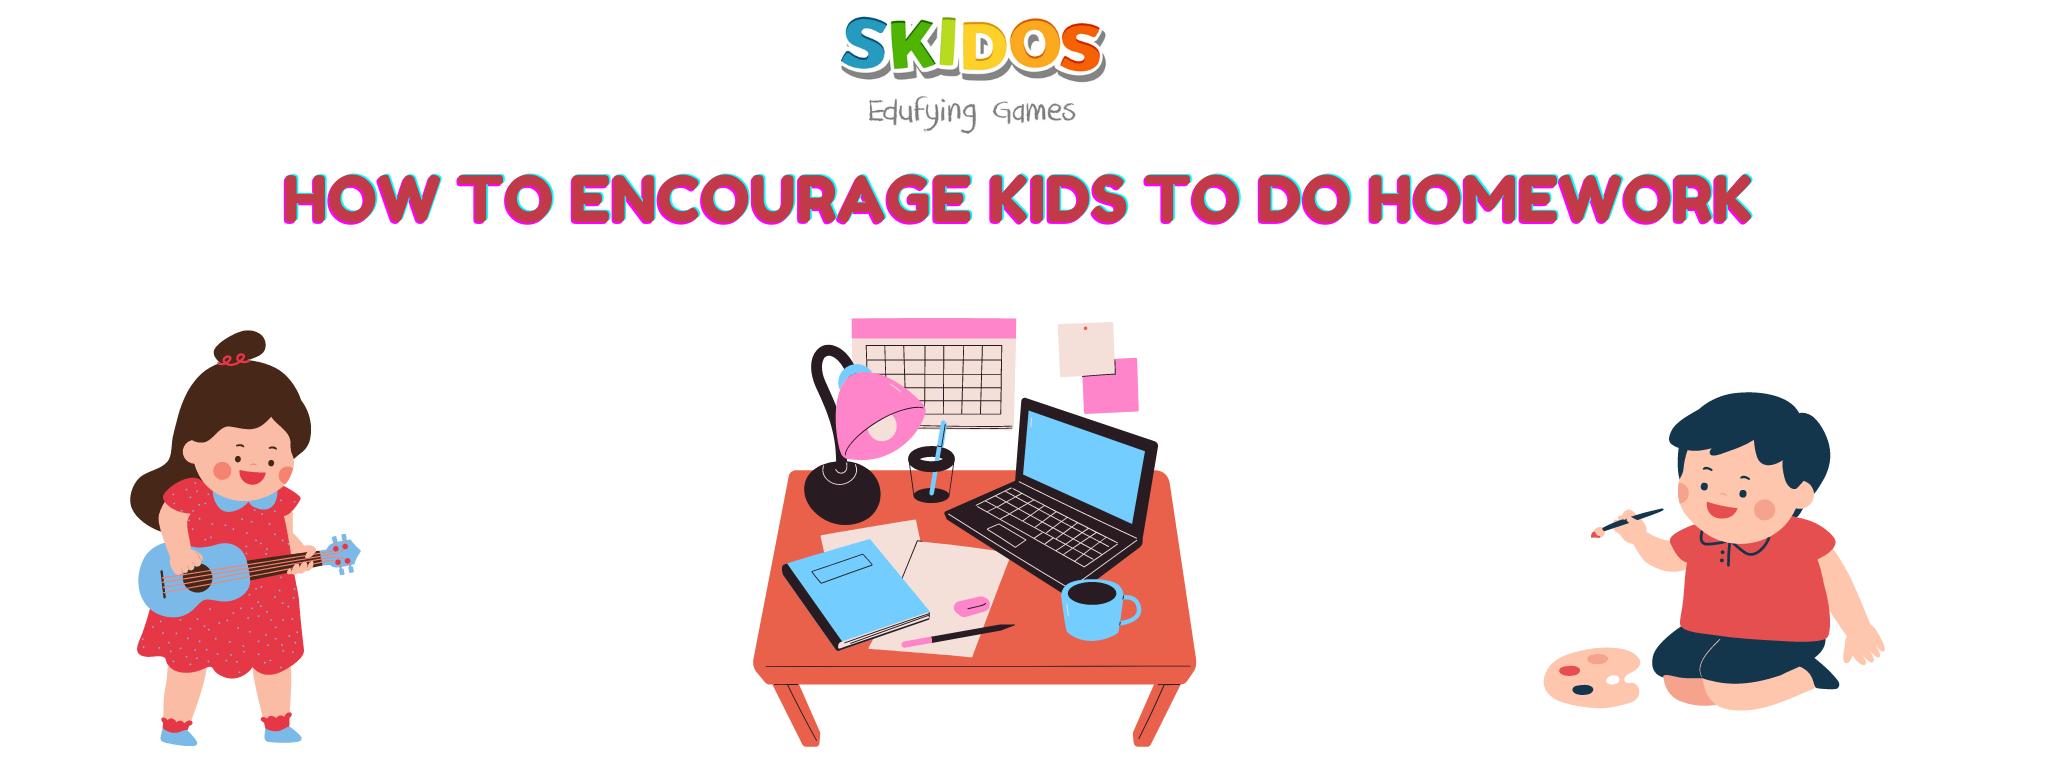 How To Encourage Kids To Do Homework